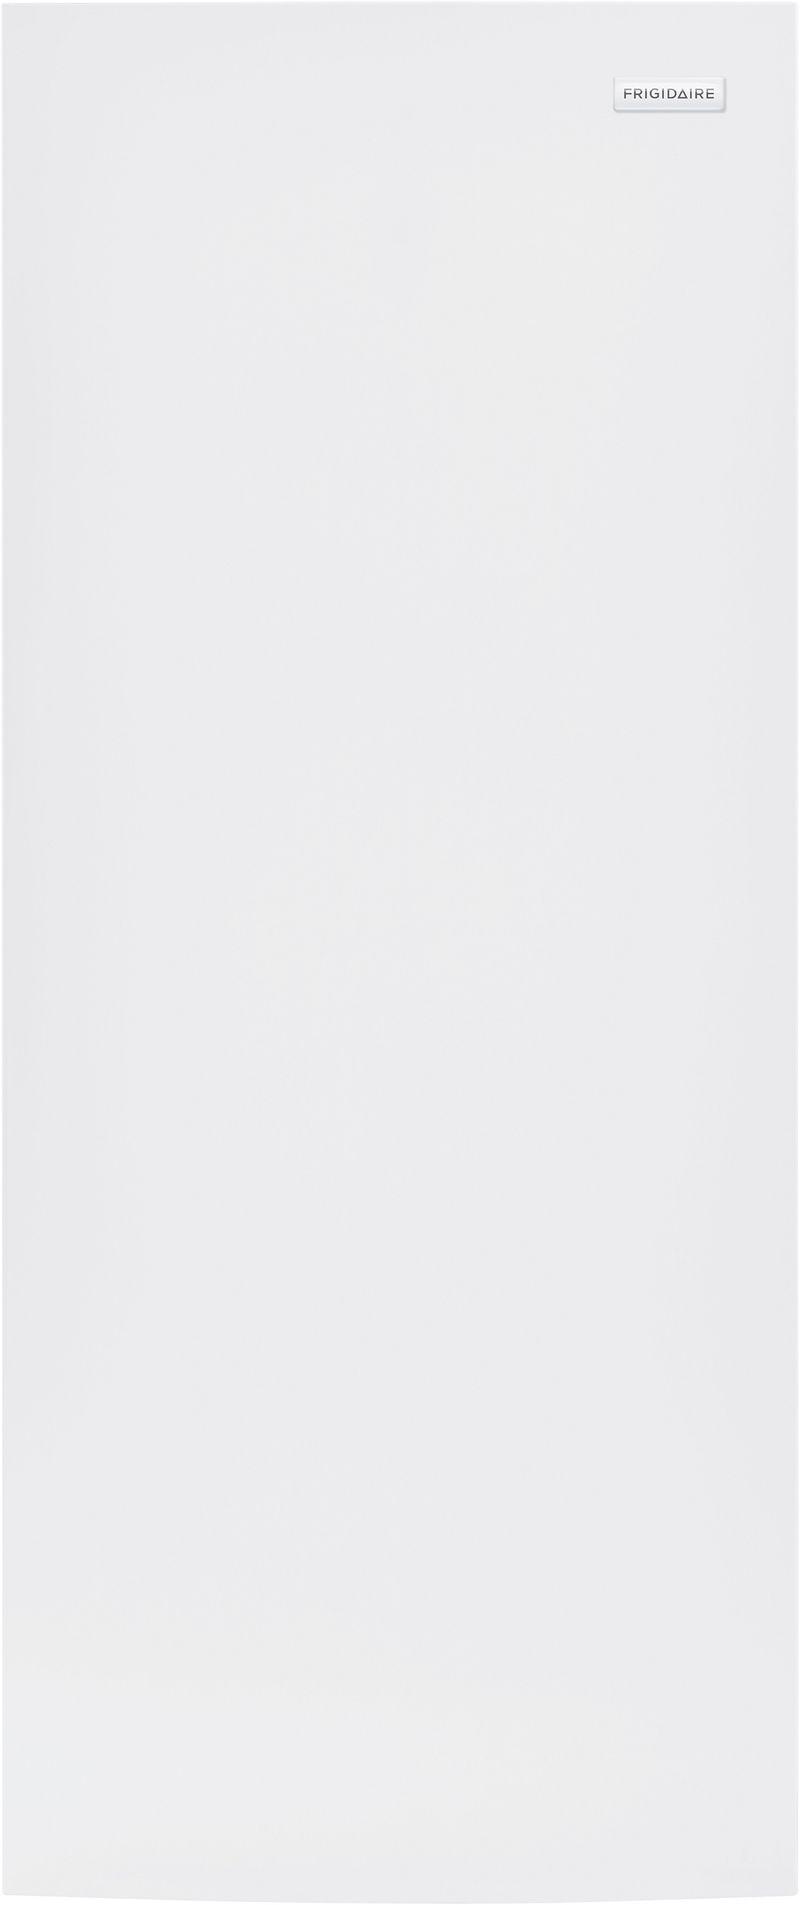 Congelador-Vertical-Frigidaire-de-13-pies-FFFU13F2VW